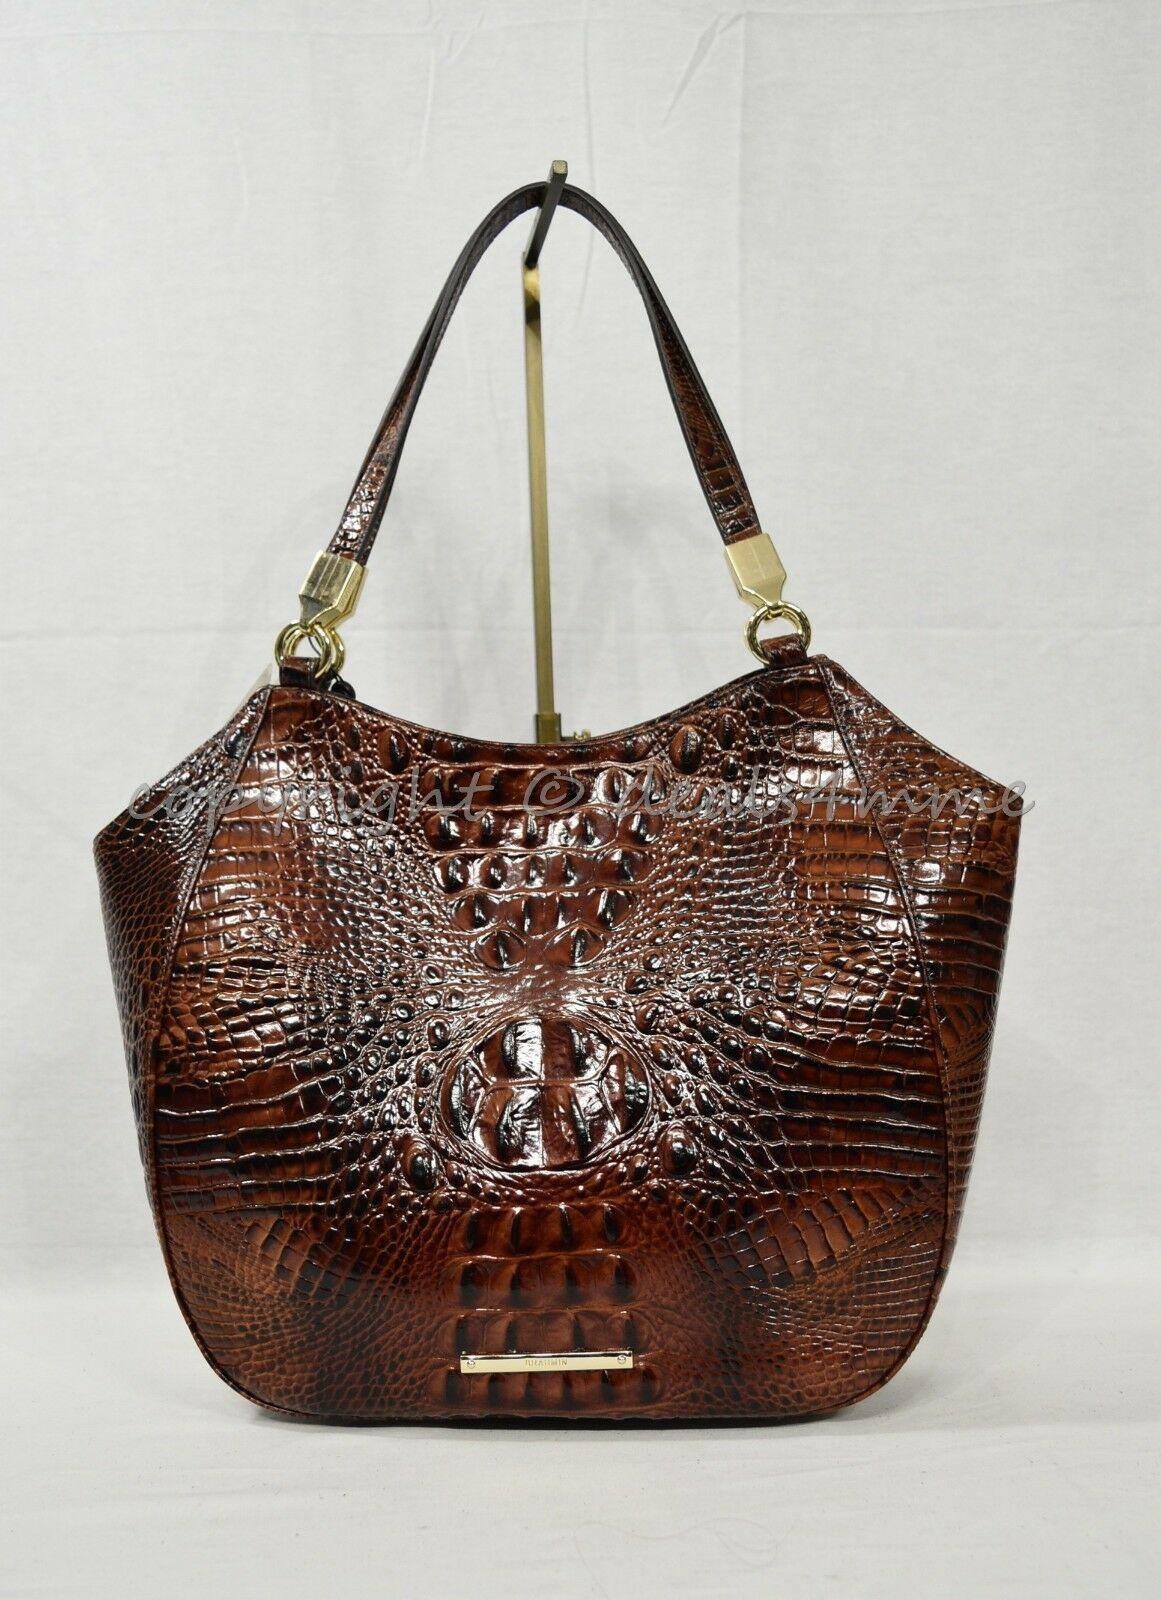 NWT Brahmin Marianna Leather Tote / Shoulder Bag in Pecan Melbourne image 2